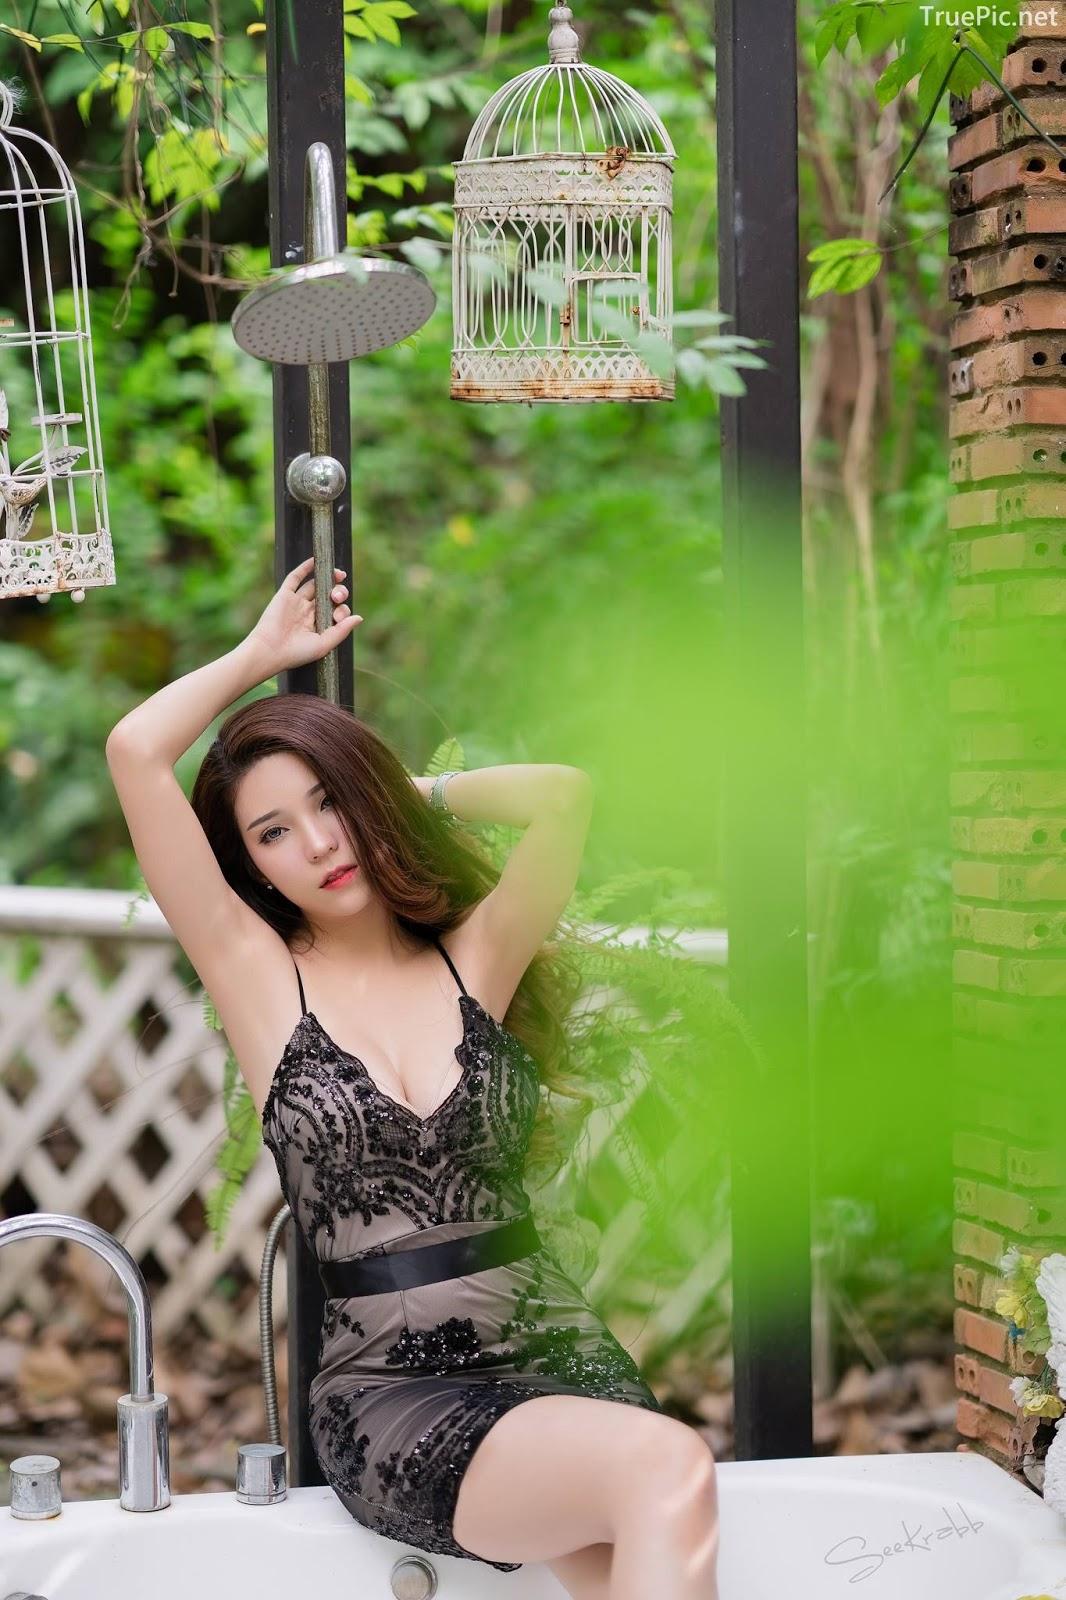 Thailand hot model - Janet Kanokwan Saesim - Black sexy garden - TruePic.net - Picture 10